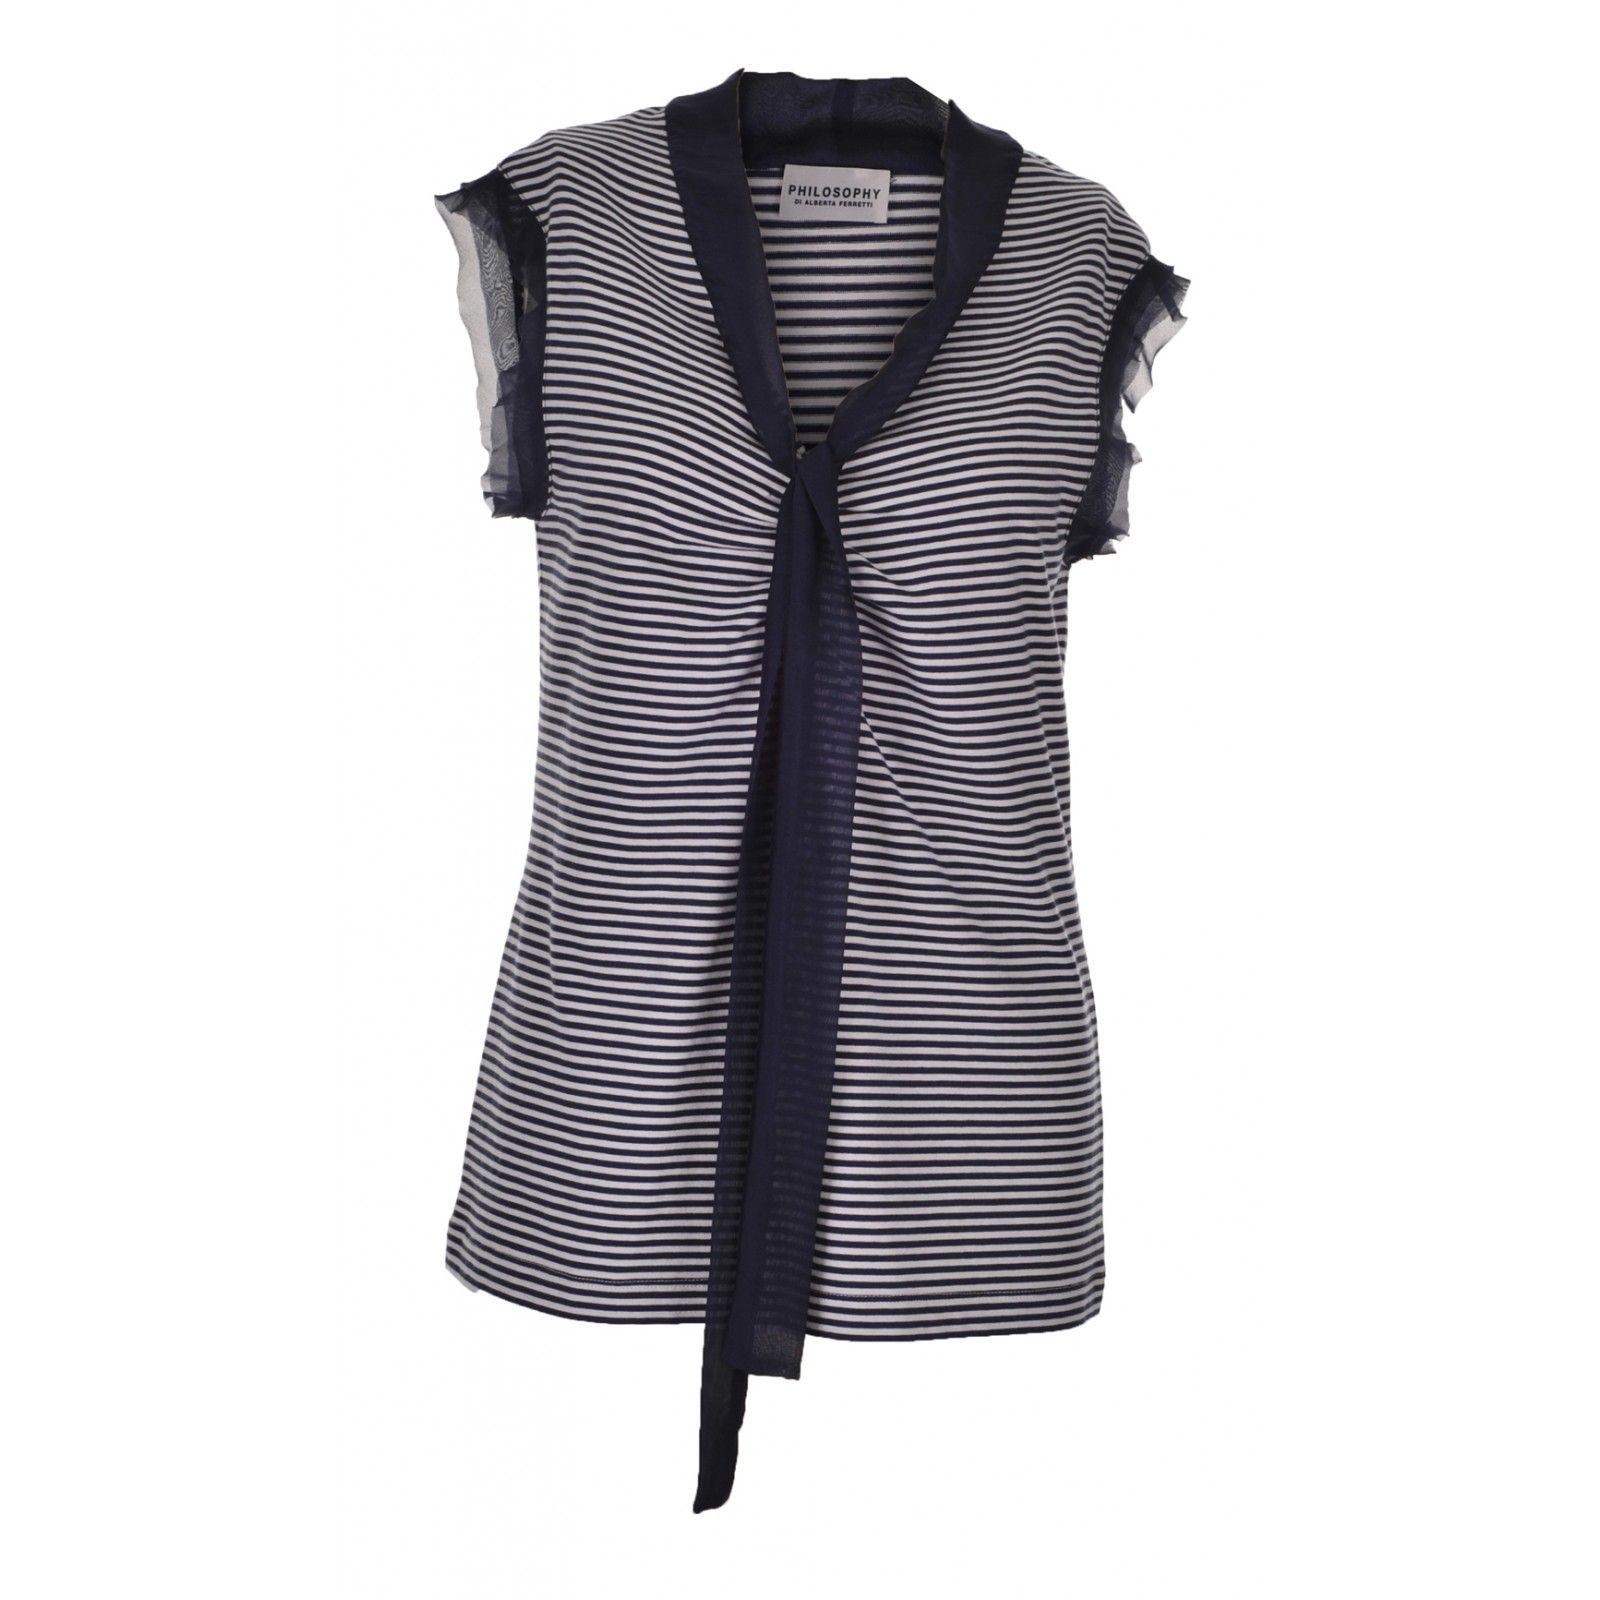 Philosophy di Alberta Ferretti striped silk chiffon-trimmed cotton top - £105    http://www.stanwells.com/by-designer/philosophy-di-alberta-ferretti/philosophy-di-alberta-ferretti-striped-silk-chiffon-trimmed-cotton-top